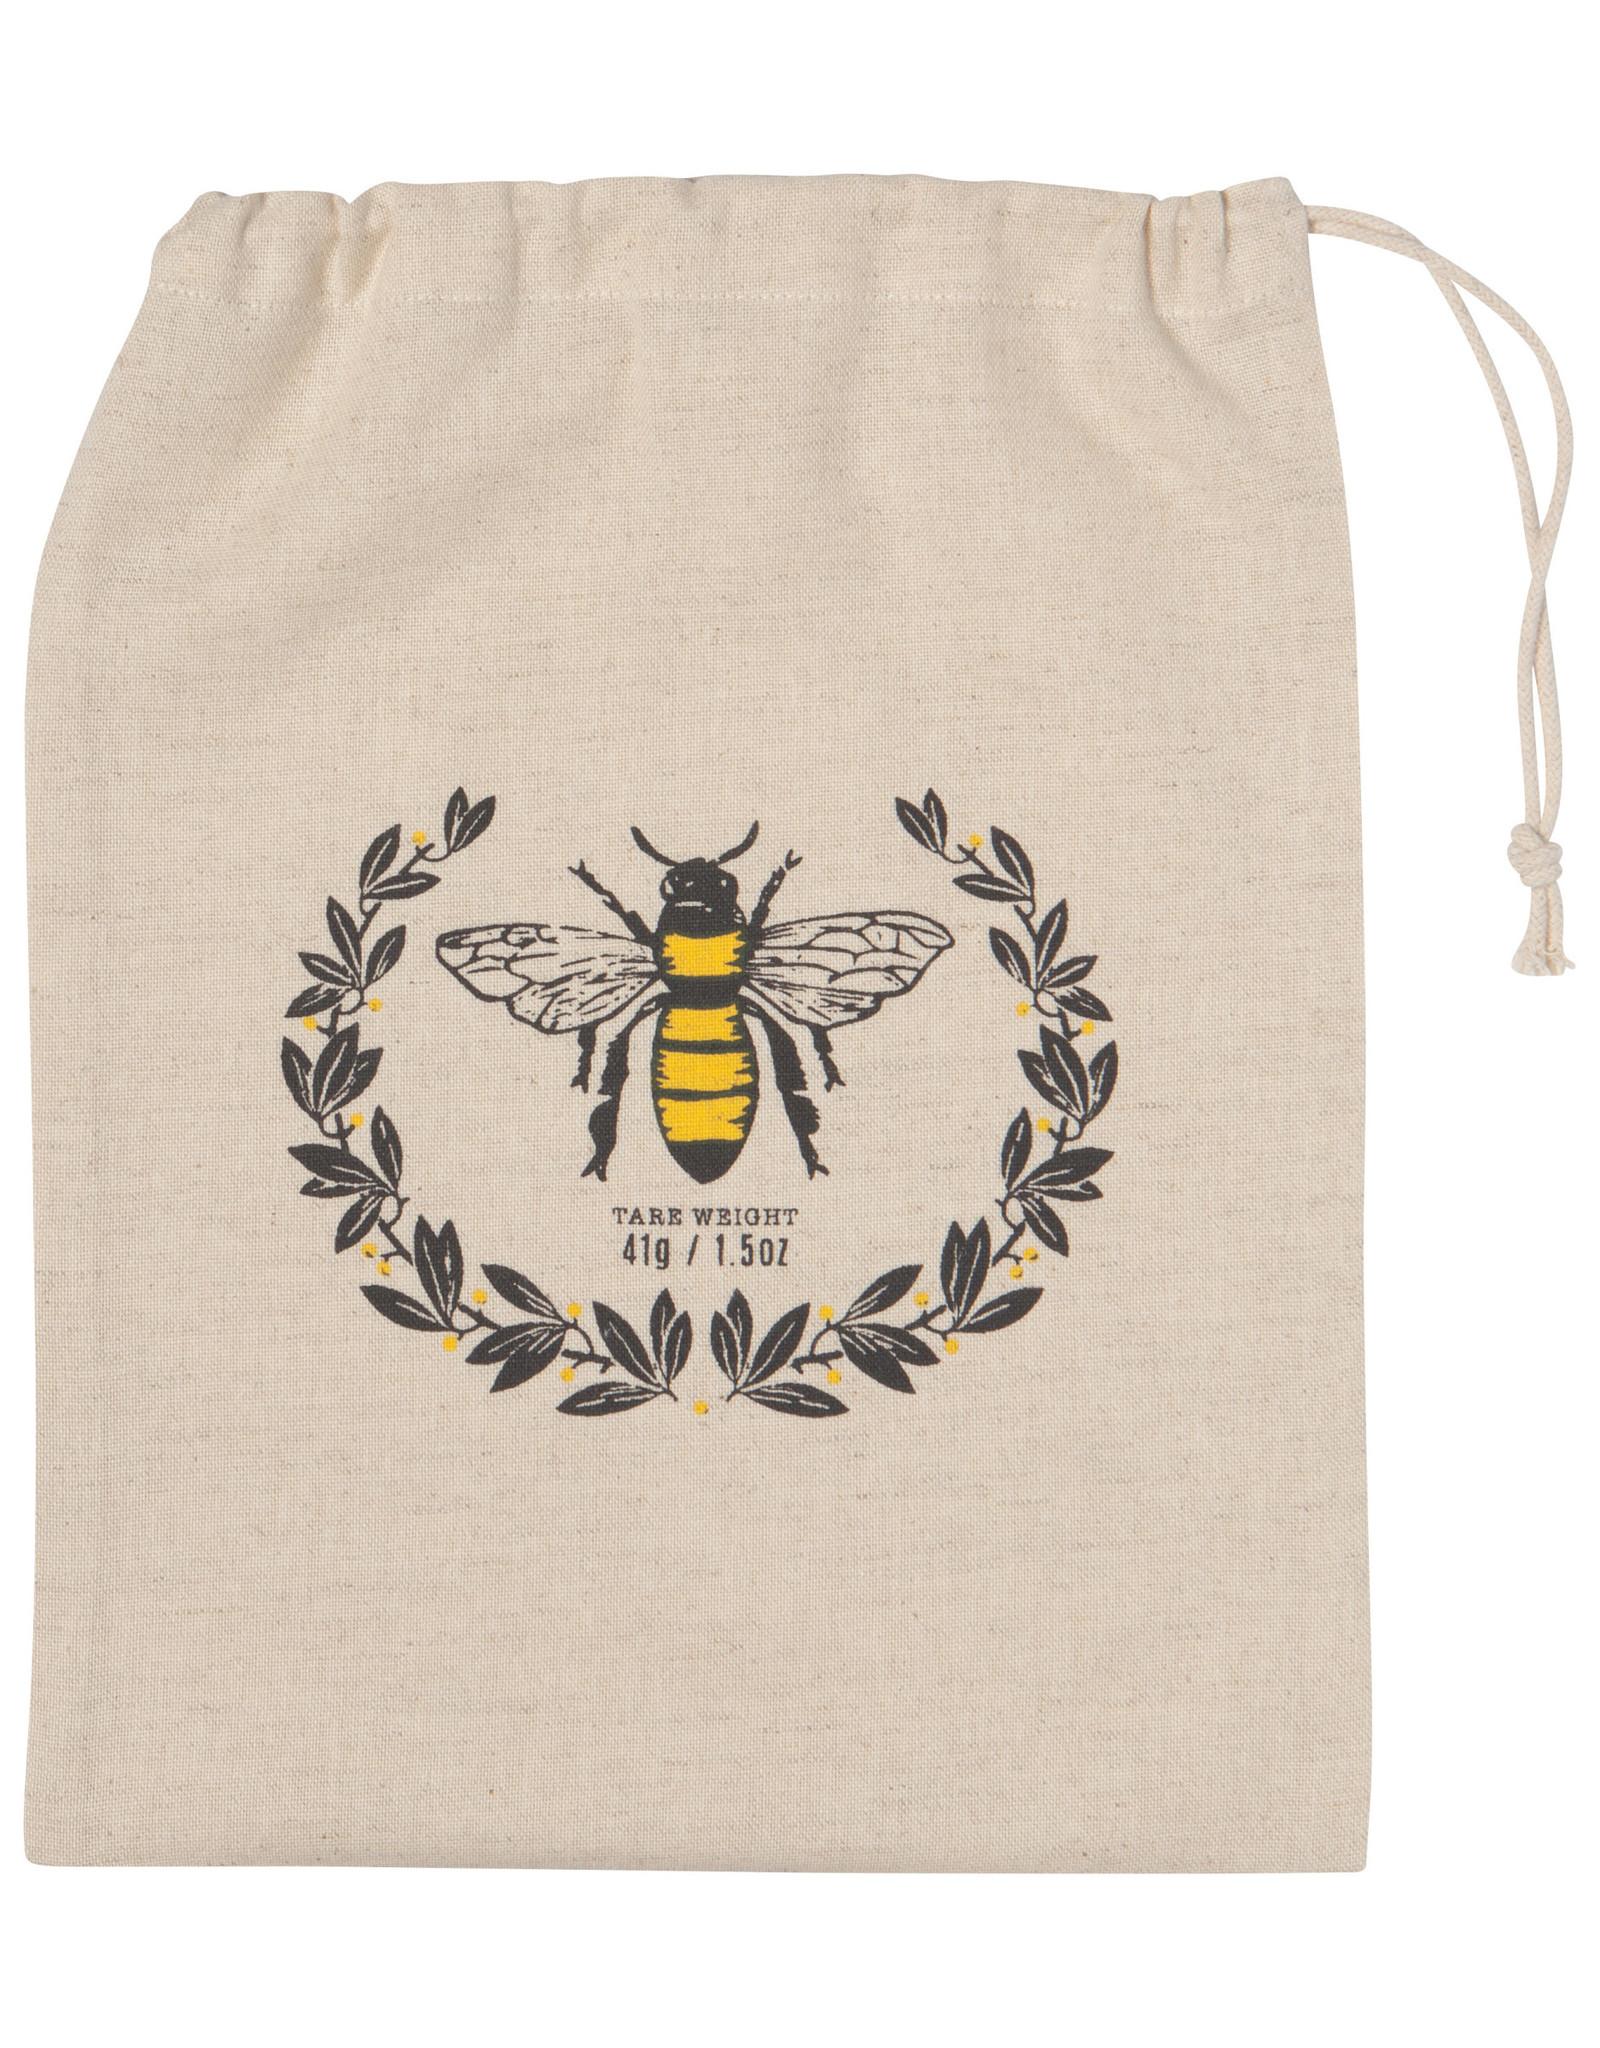 Danica Danica - Produce Bag set of 3 - Busy Bee